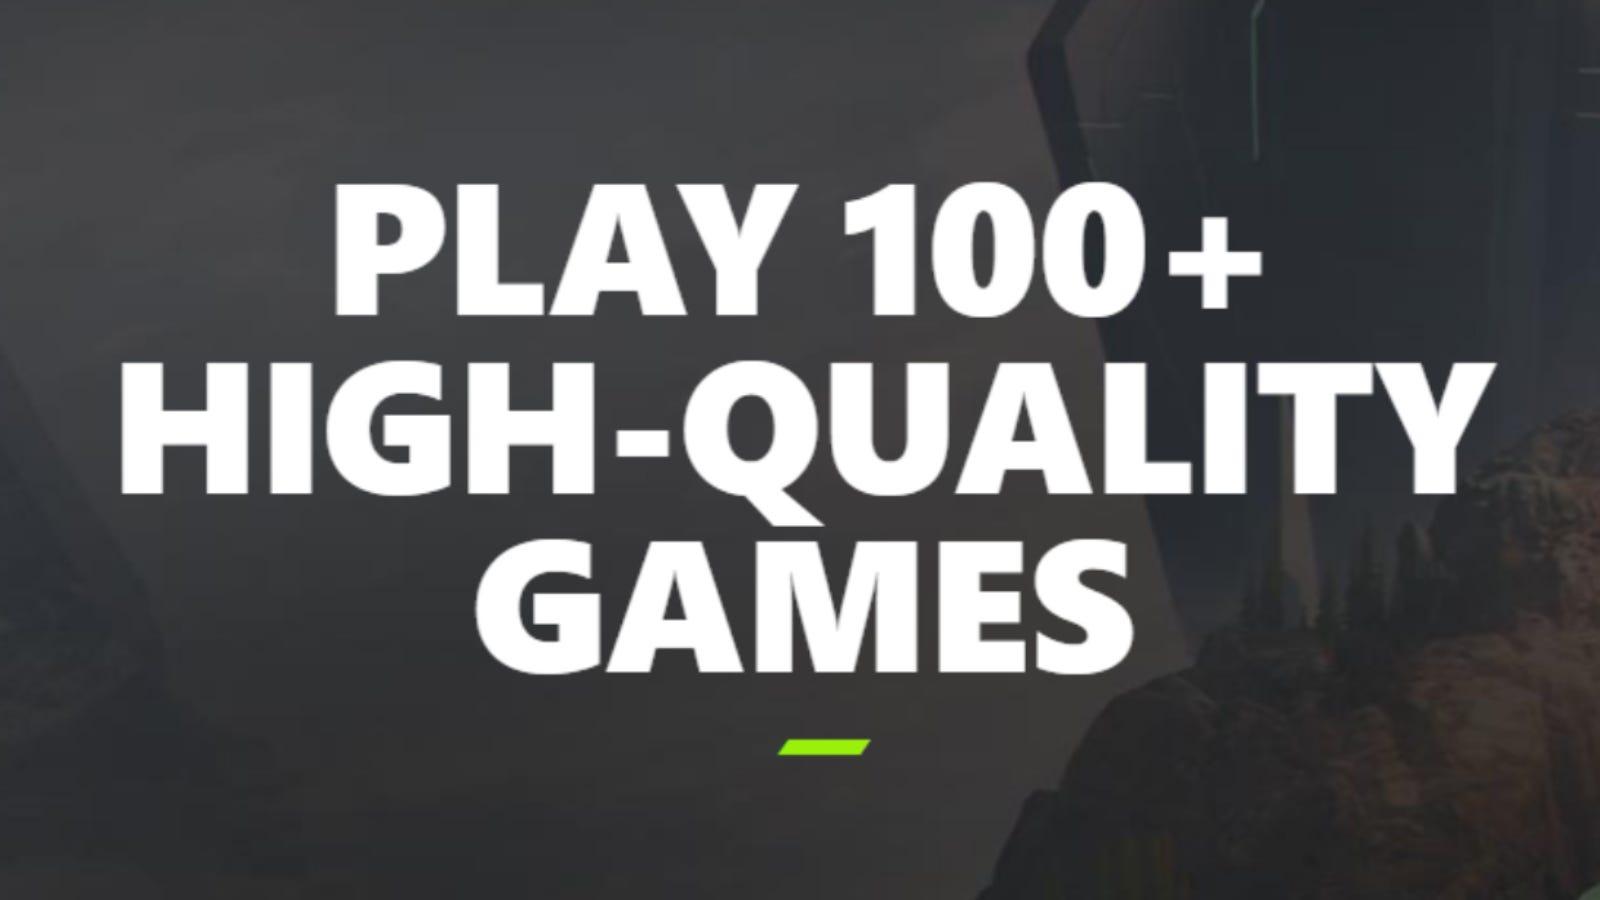 Xbox Game Pass website graphic